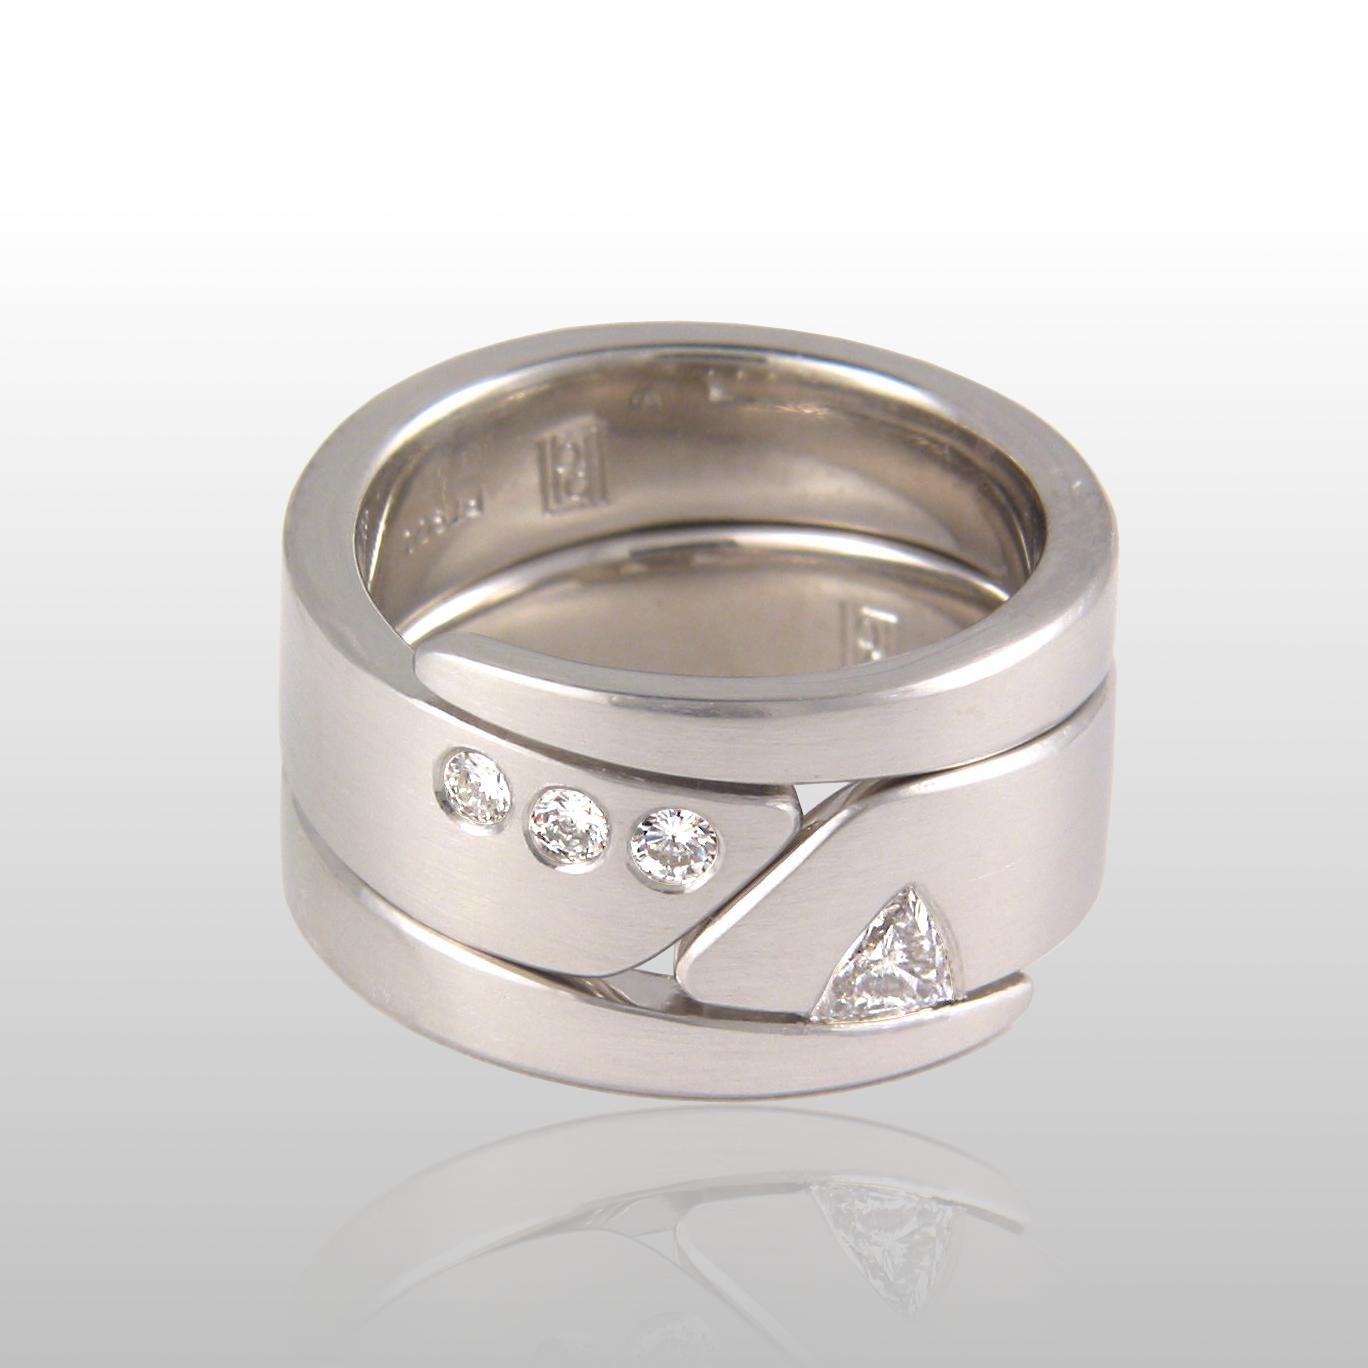 Contemporary wedding band set 'Duo' in platinum with diamonds by Pratima Design Fine Art Jewelry